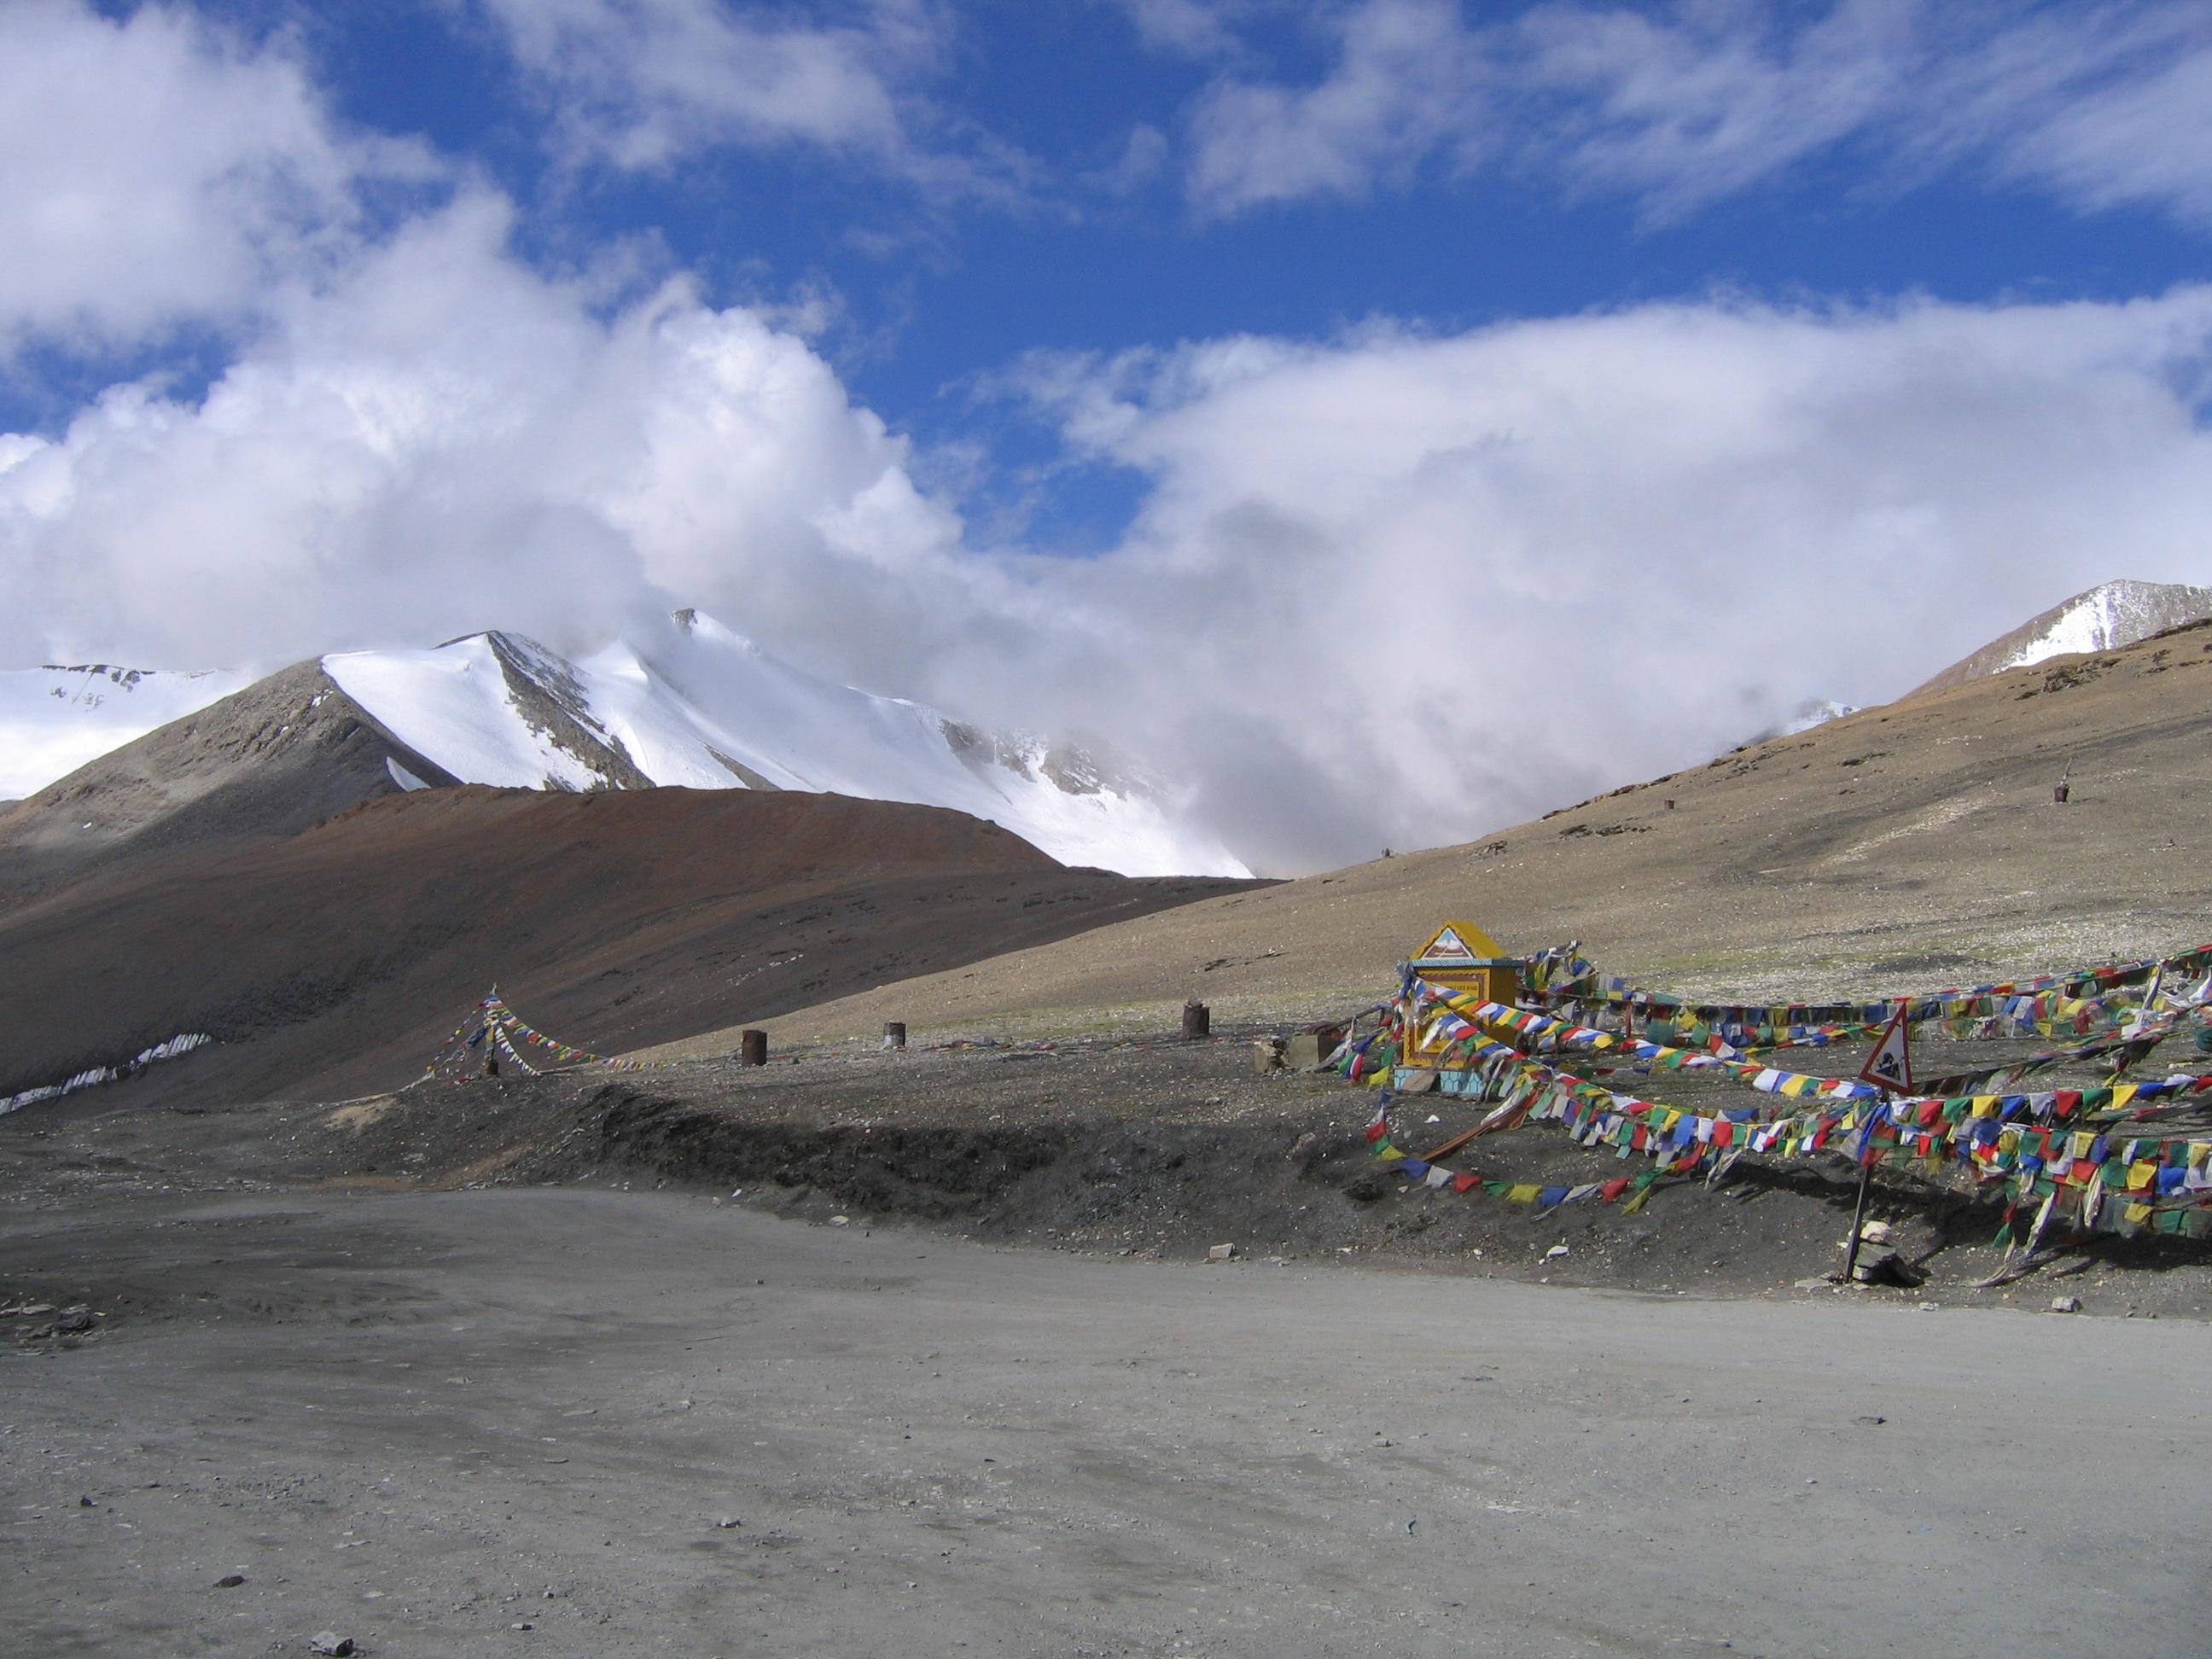 Ladakh, The Land of High Passes